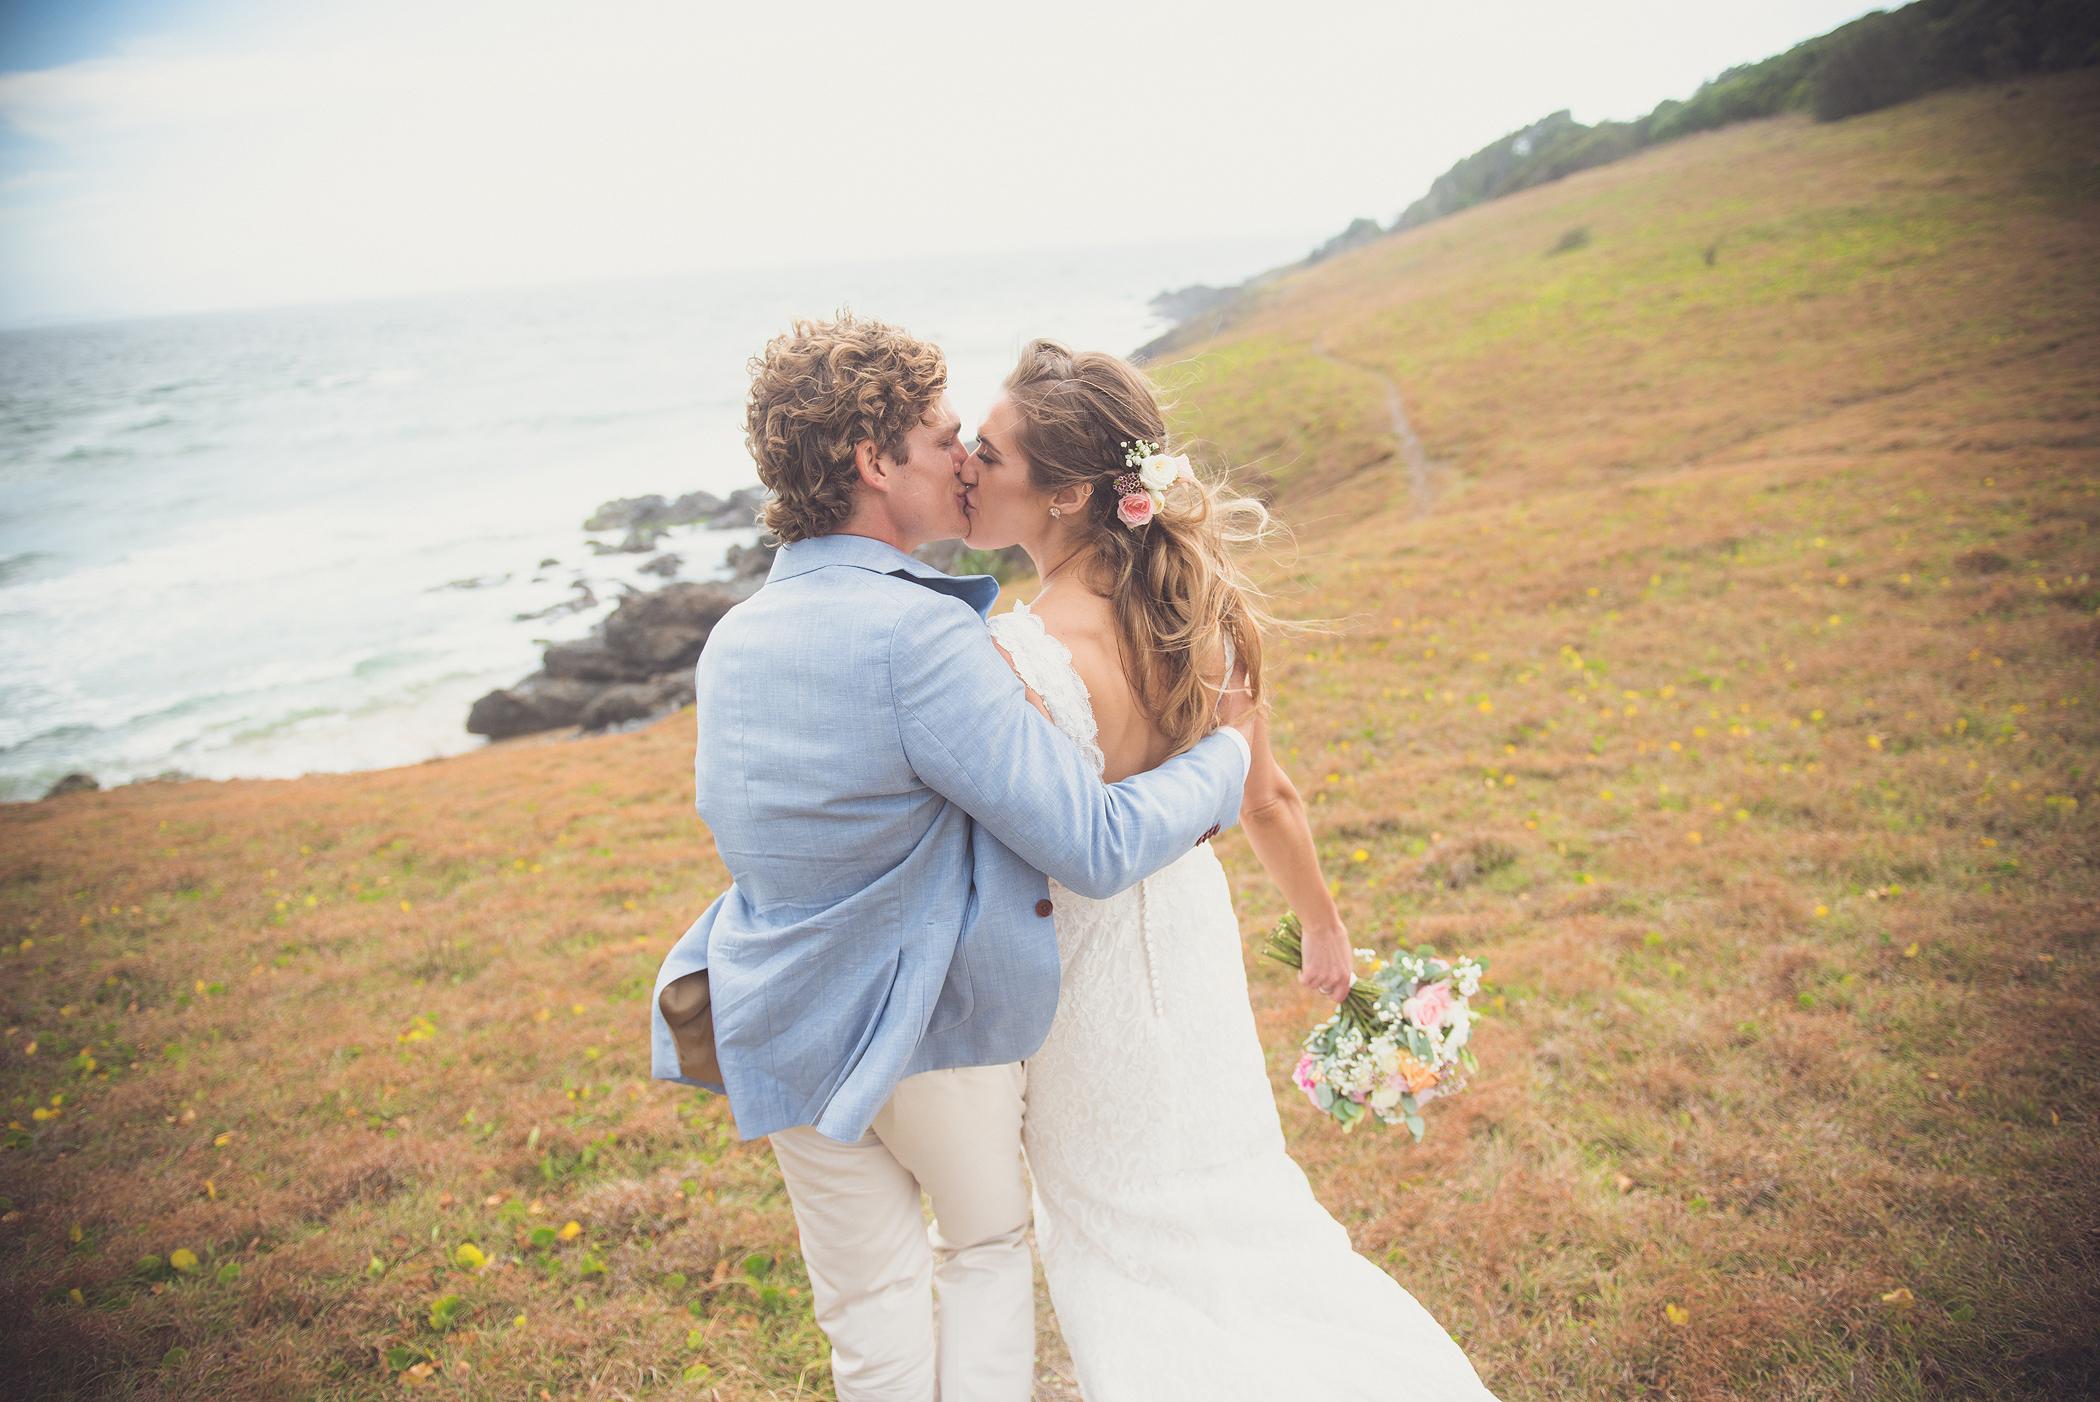 Crescent Head Wedding